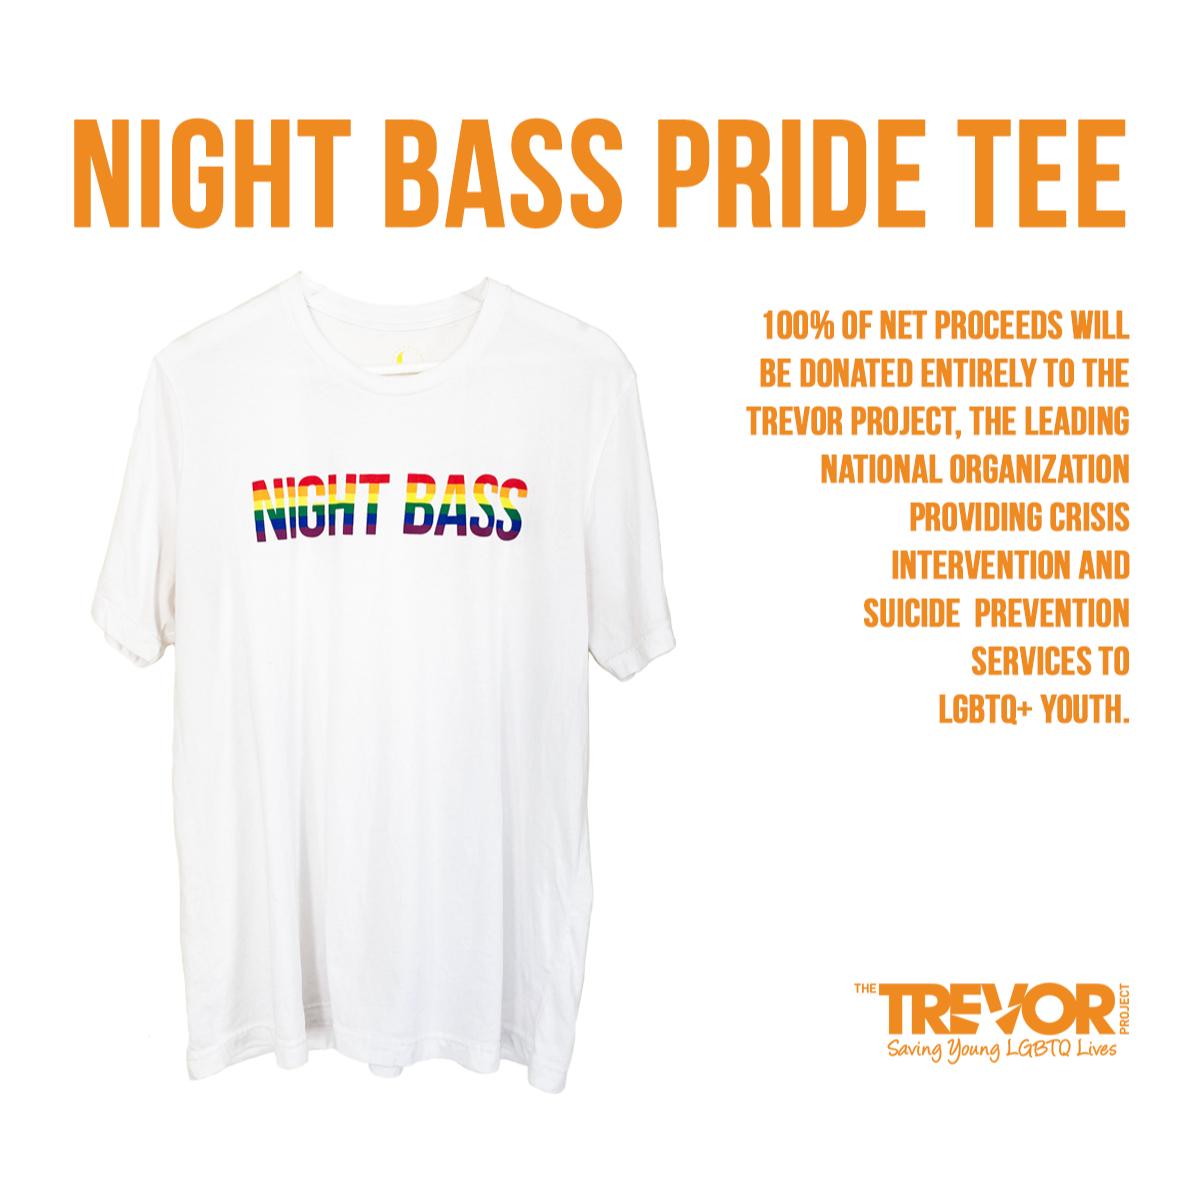 Night Bass Pride Tee